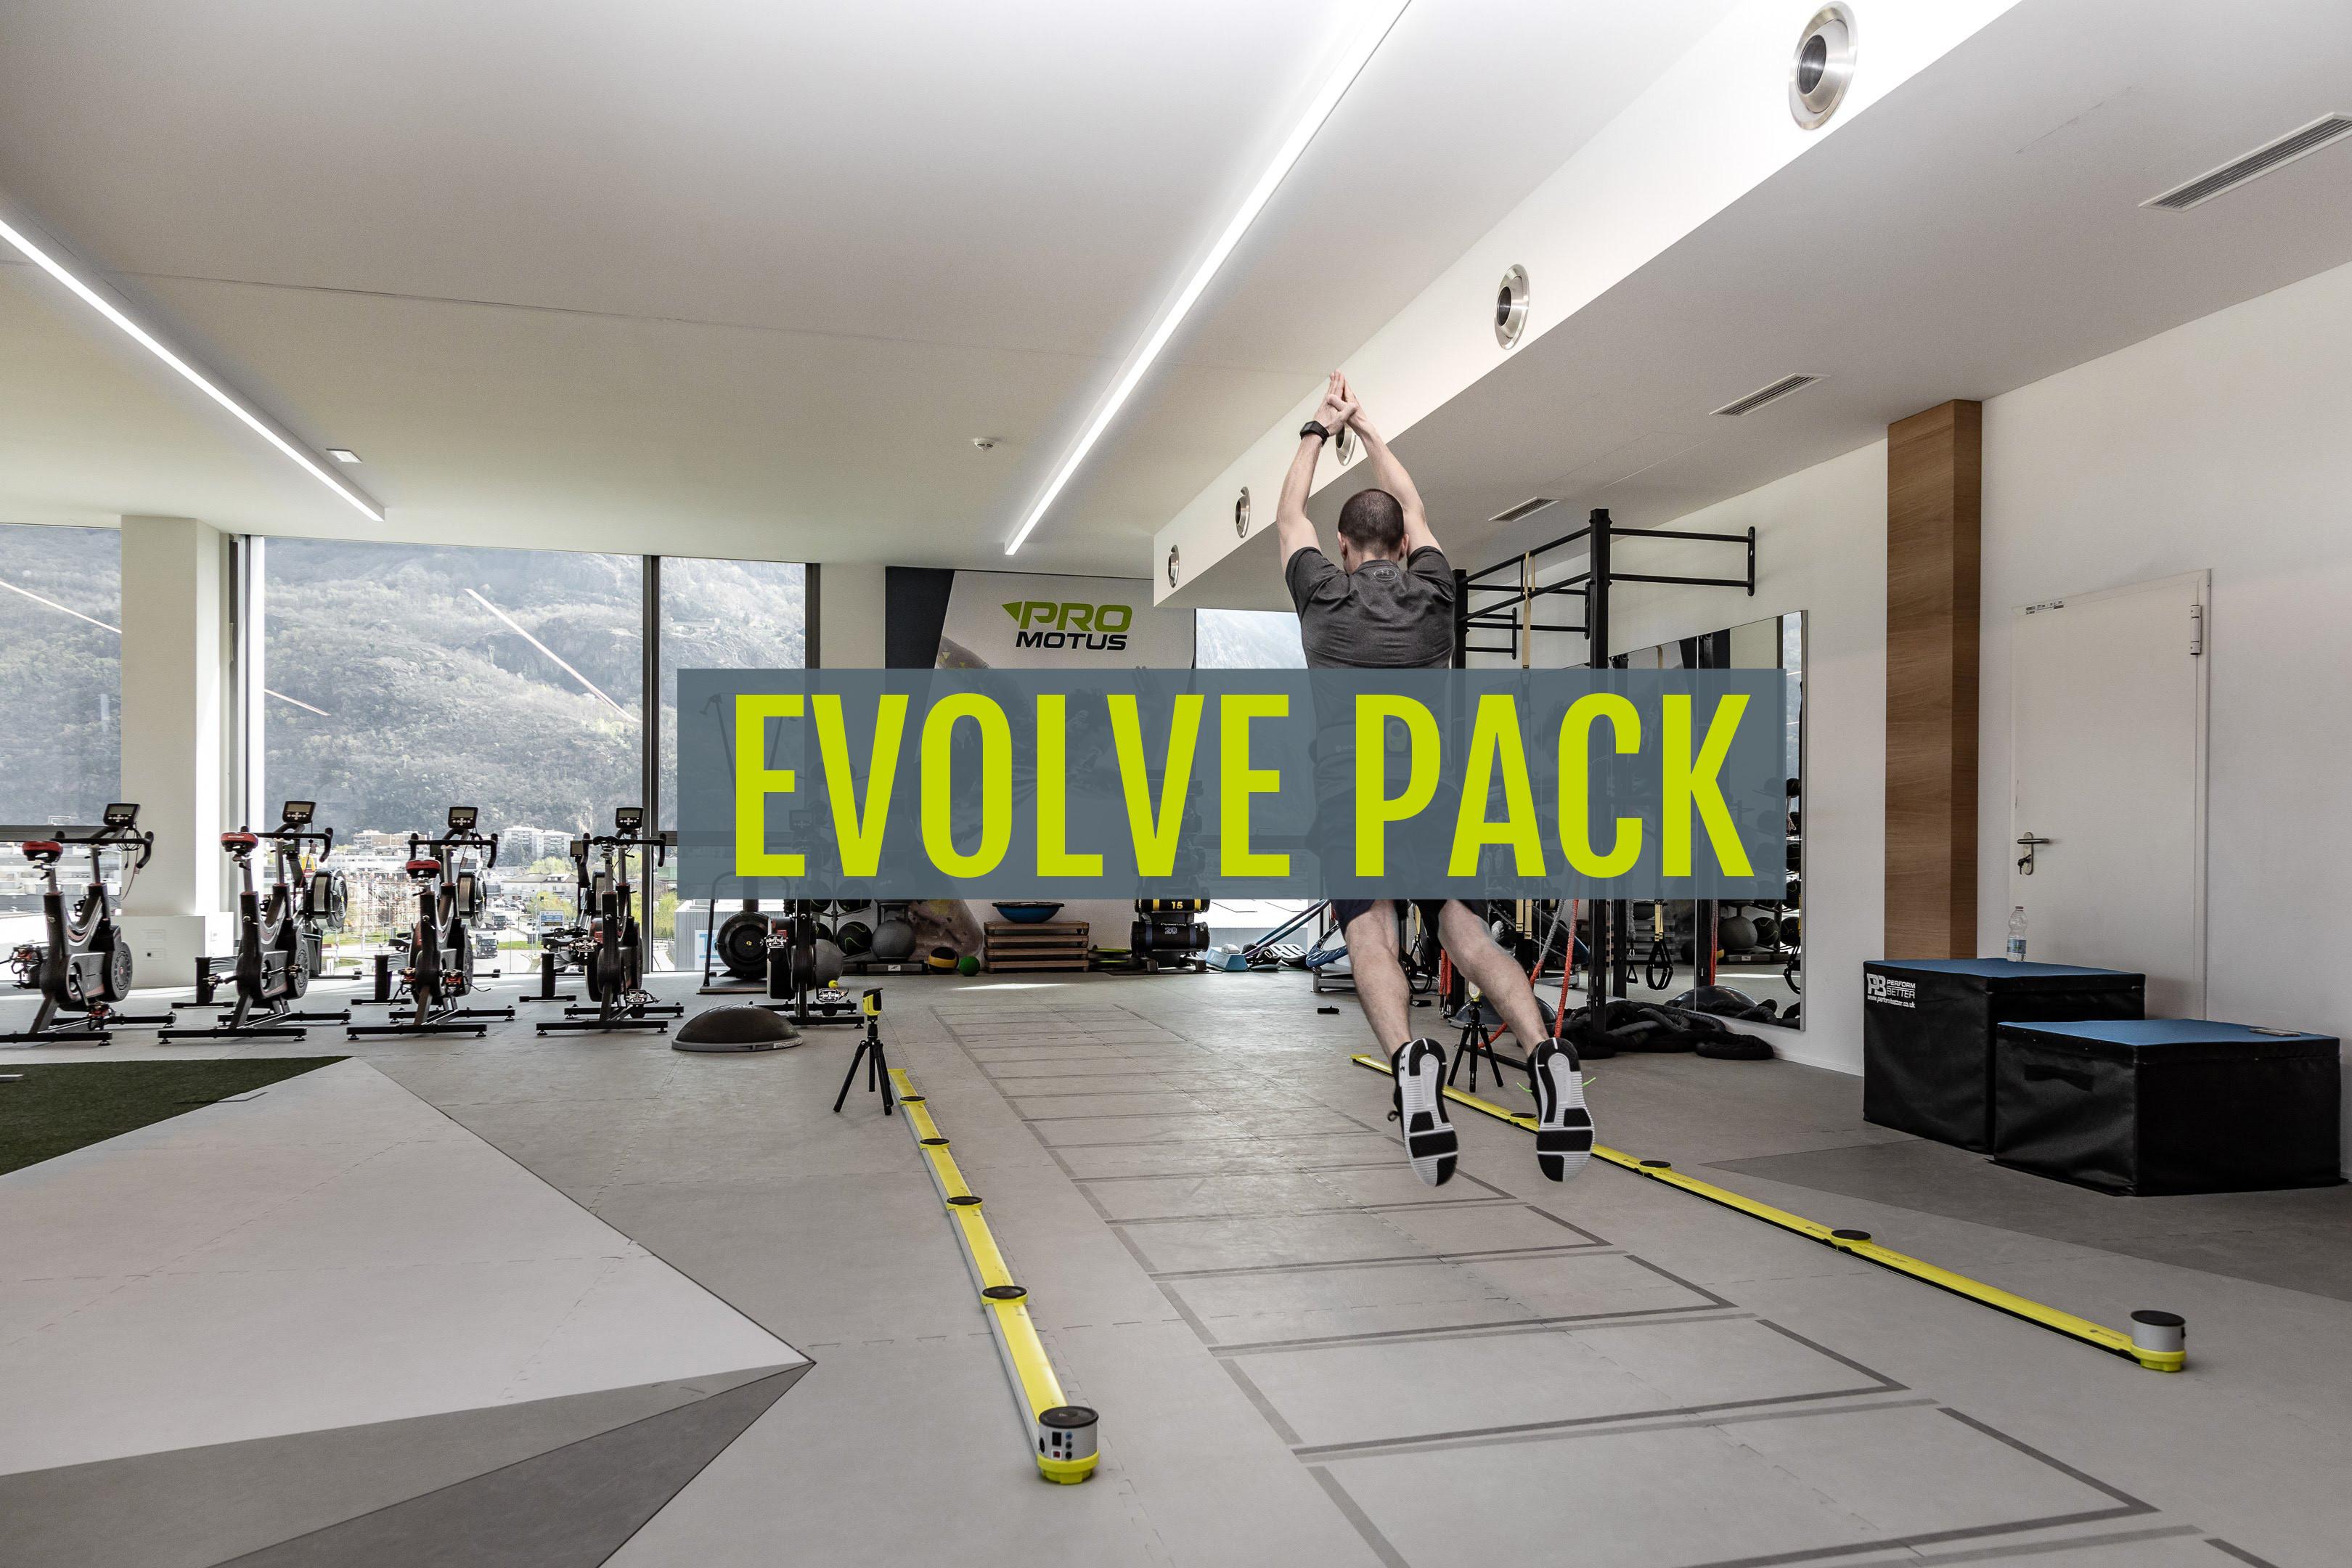 Ski - Evolve Pack